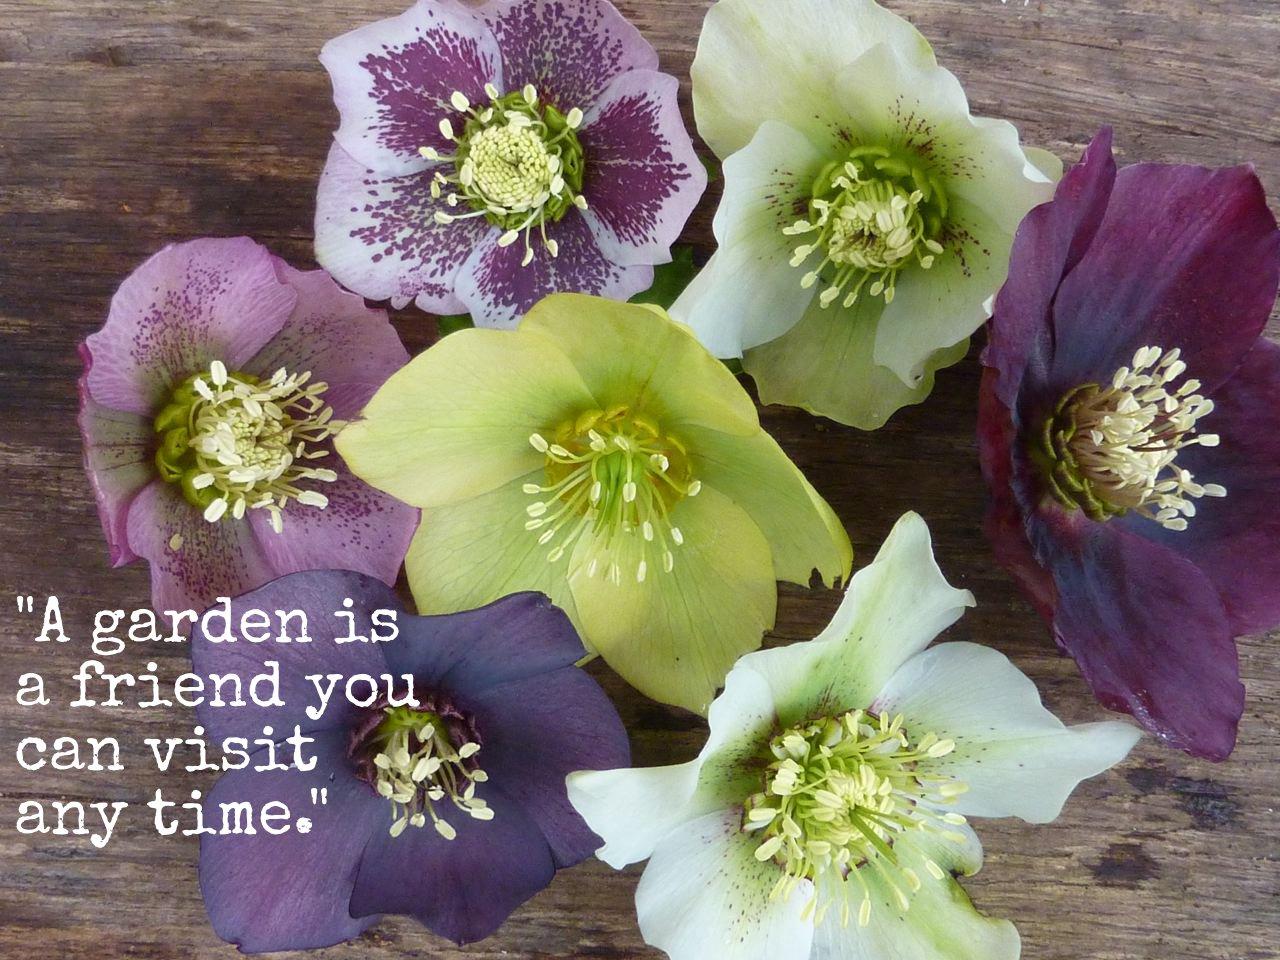 Garden quote #2